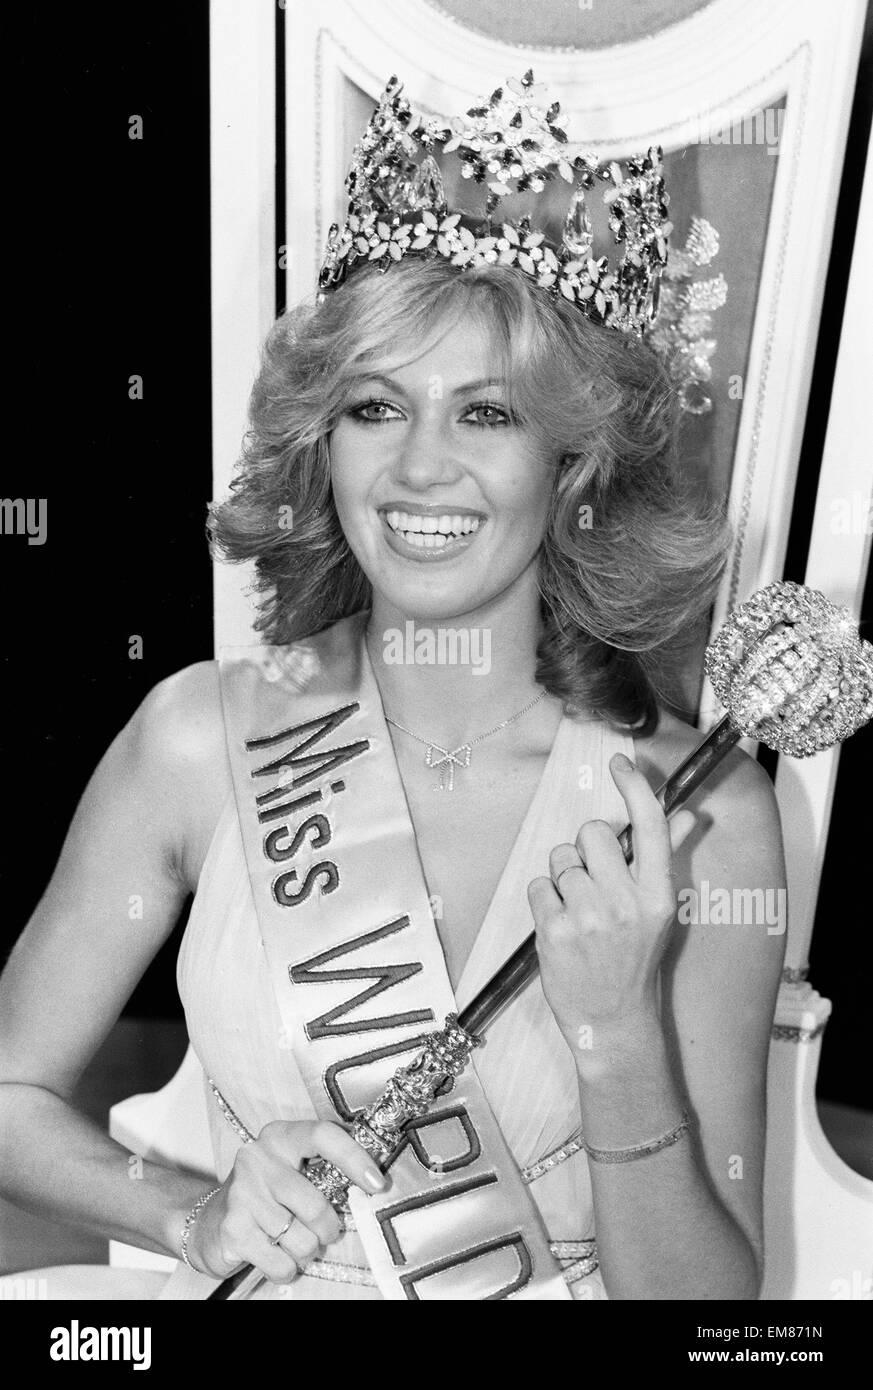 Miss World 1980. Miss Germany Gabriella Brum is crowned